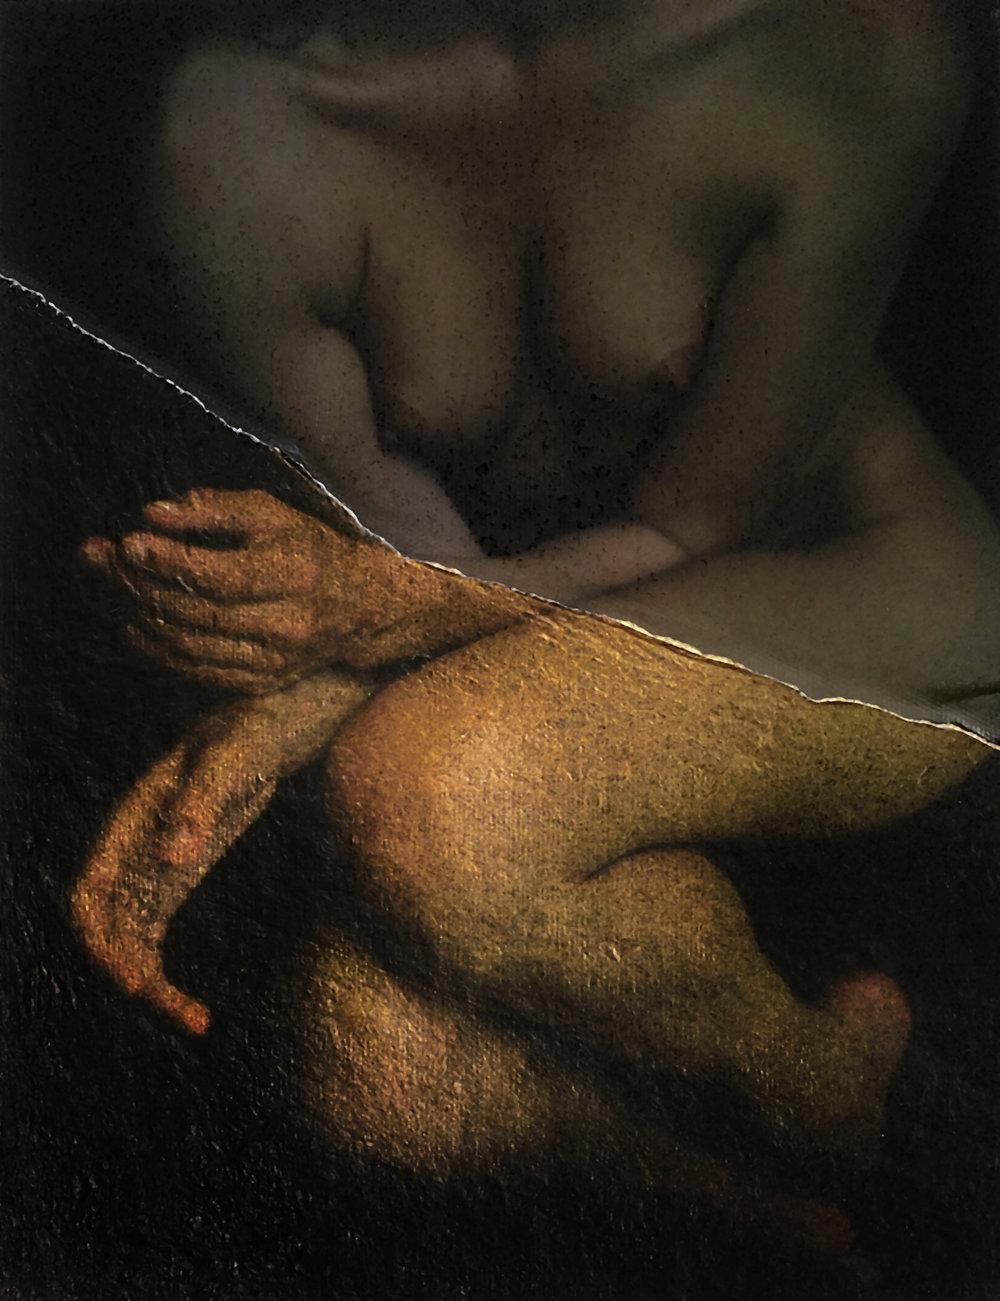 GTB_Fabien-Dettori_FD6_Courtesy Galerie Thierry Bigaignon.jpg